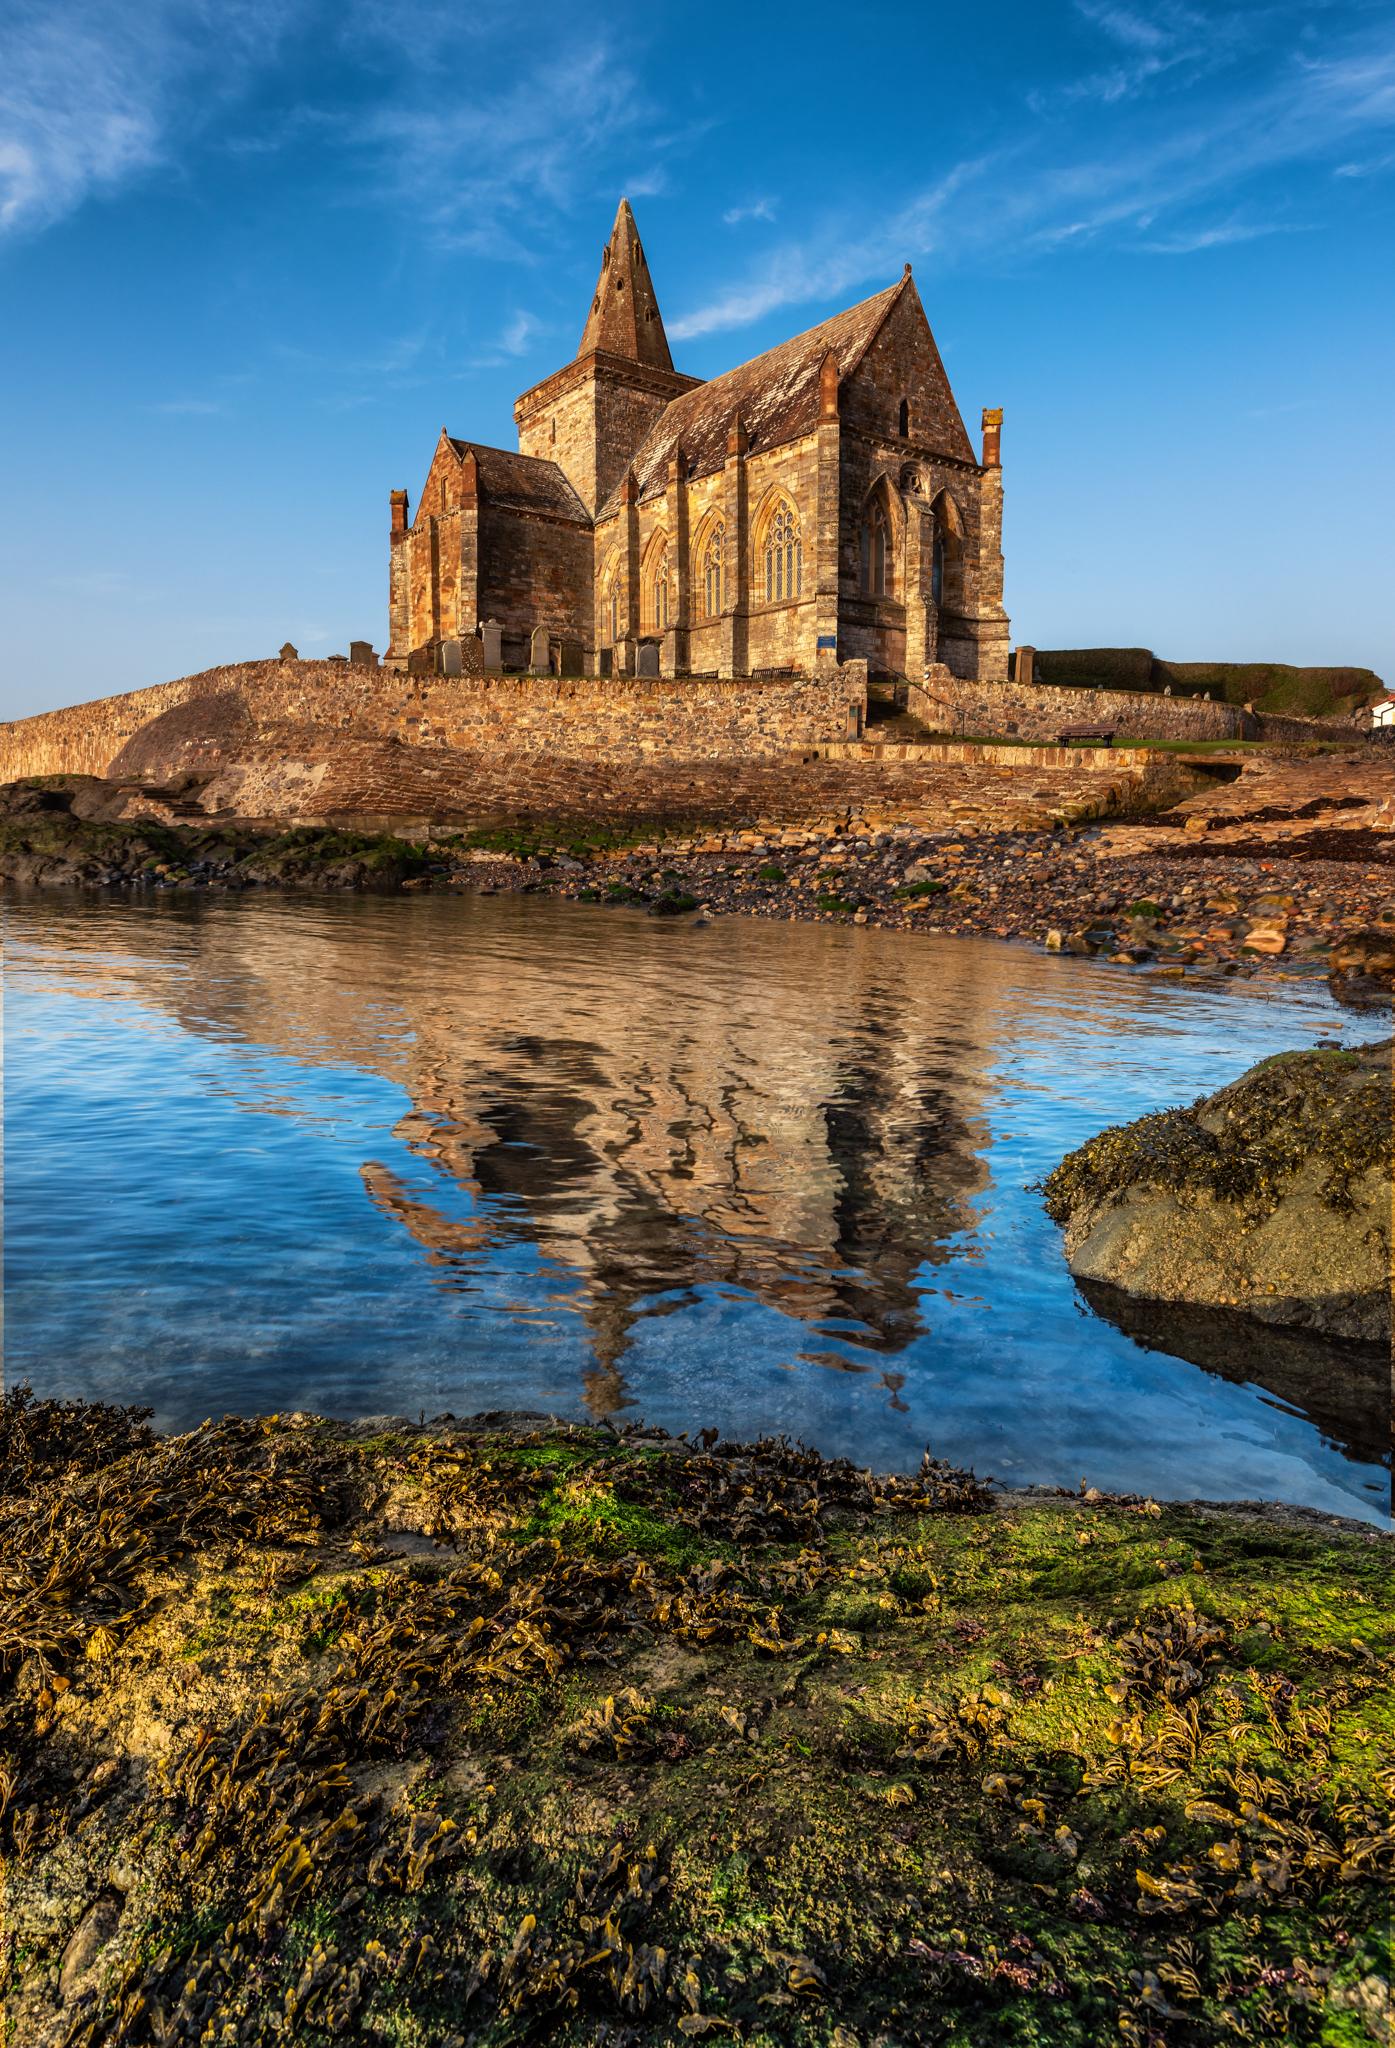 St. Monans Auld Kirk